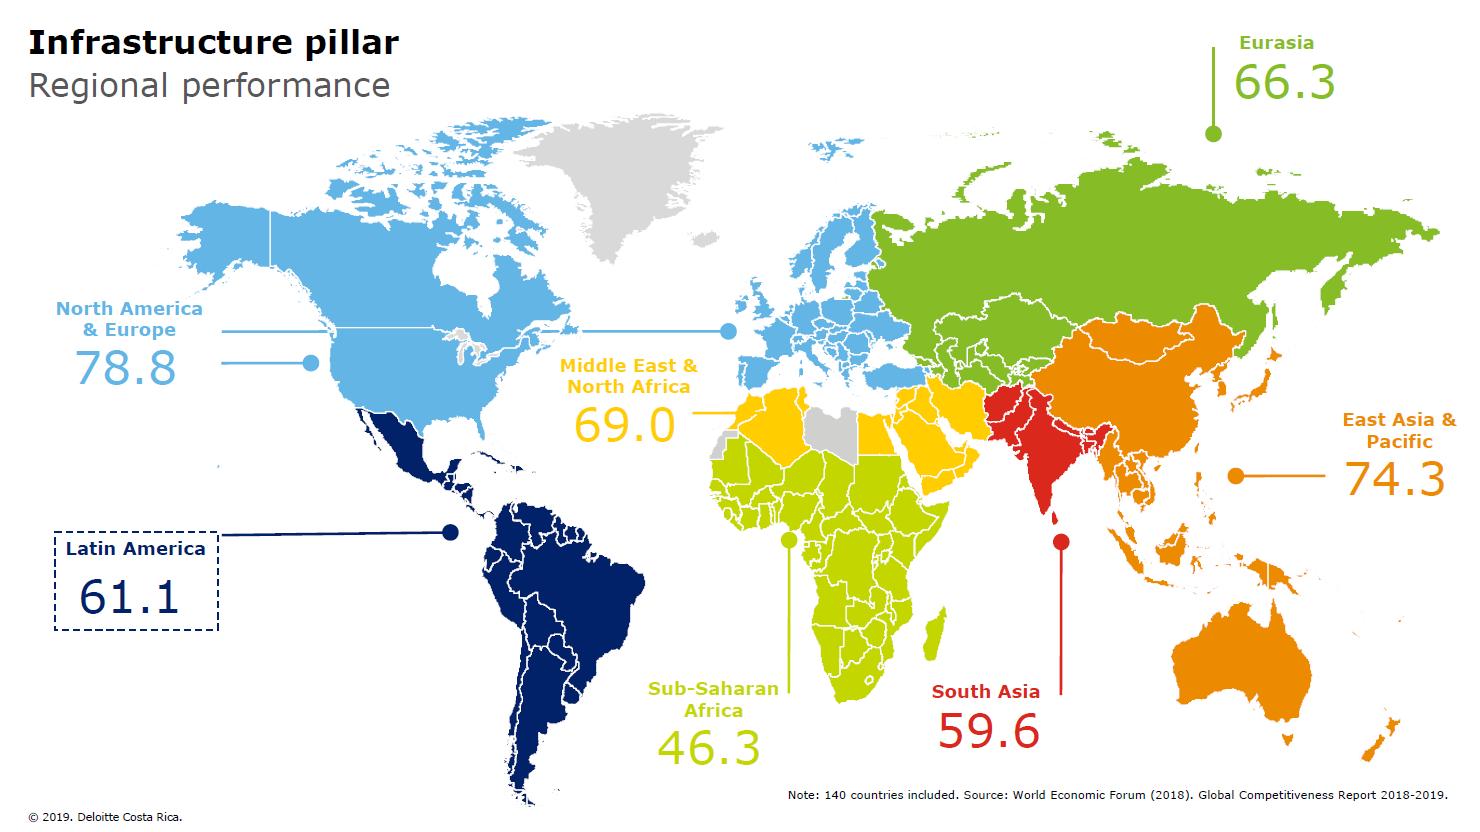 Fuente: Deloitte Centroamérica con base en datos del Foro Económico Mundial.